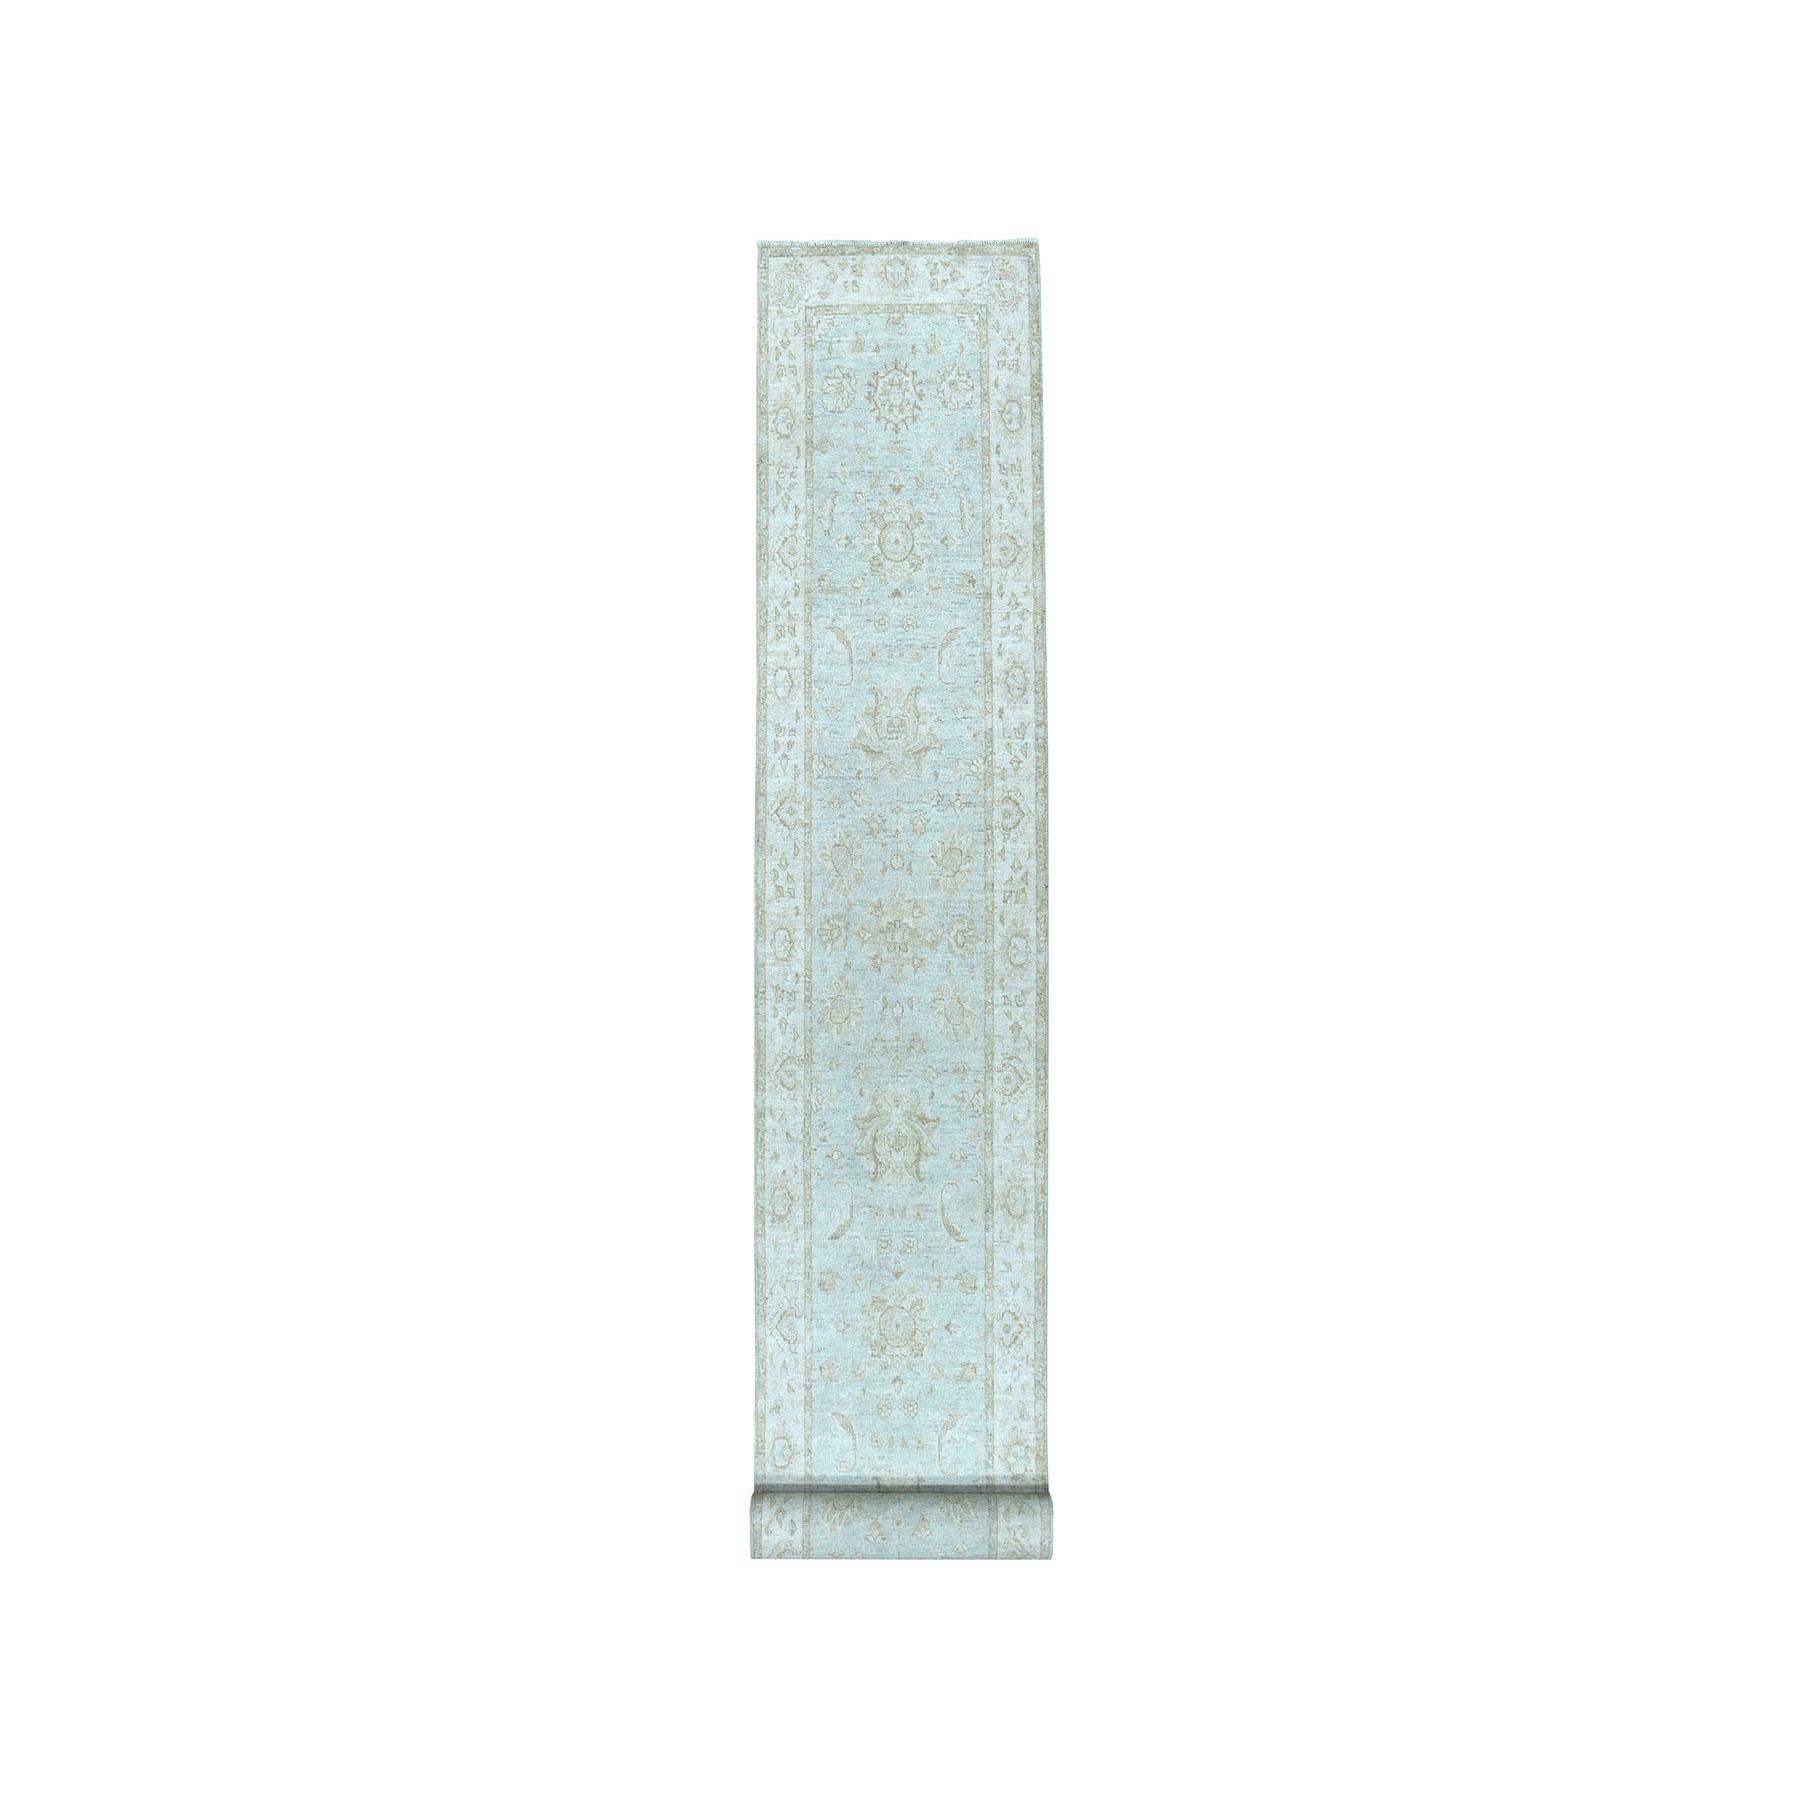 "2'8""x15'9"" White Wash Peshawar Pure Wool Hand-Knotted Oriental XL Runner Rug"